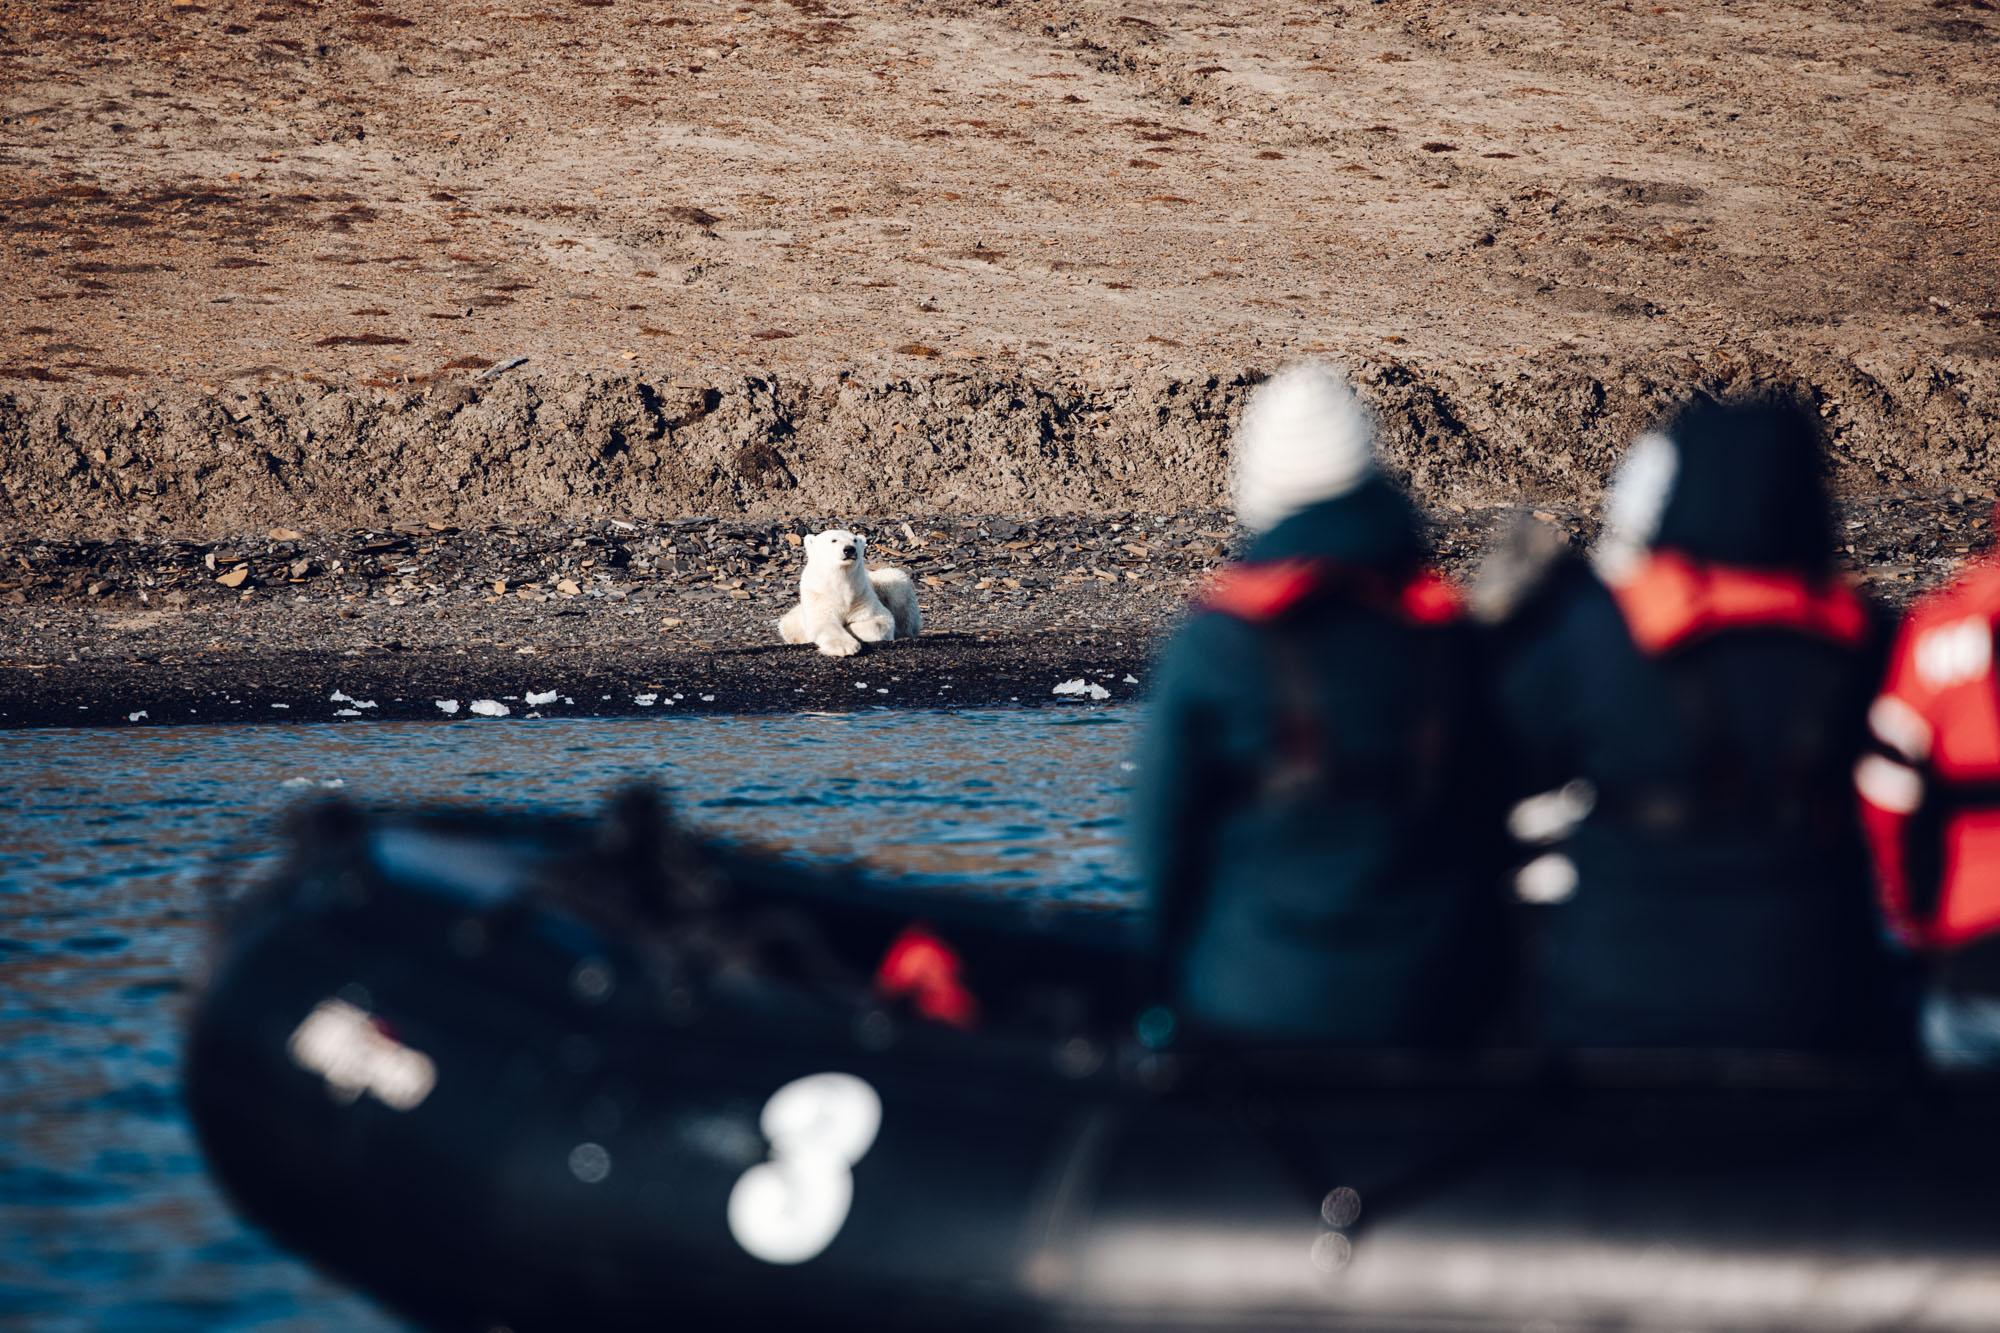 Polar bear from the polarquest zodiac boat in Spitsbergen, Svalbard, Norway